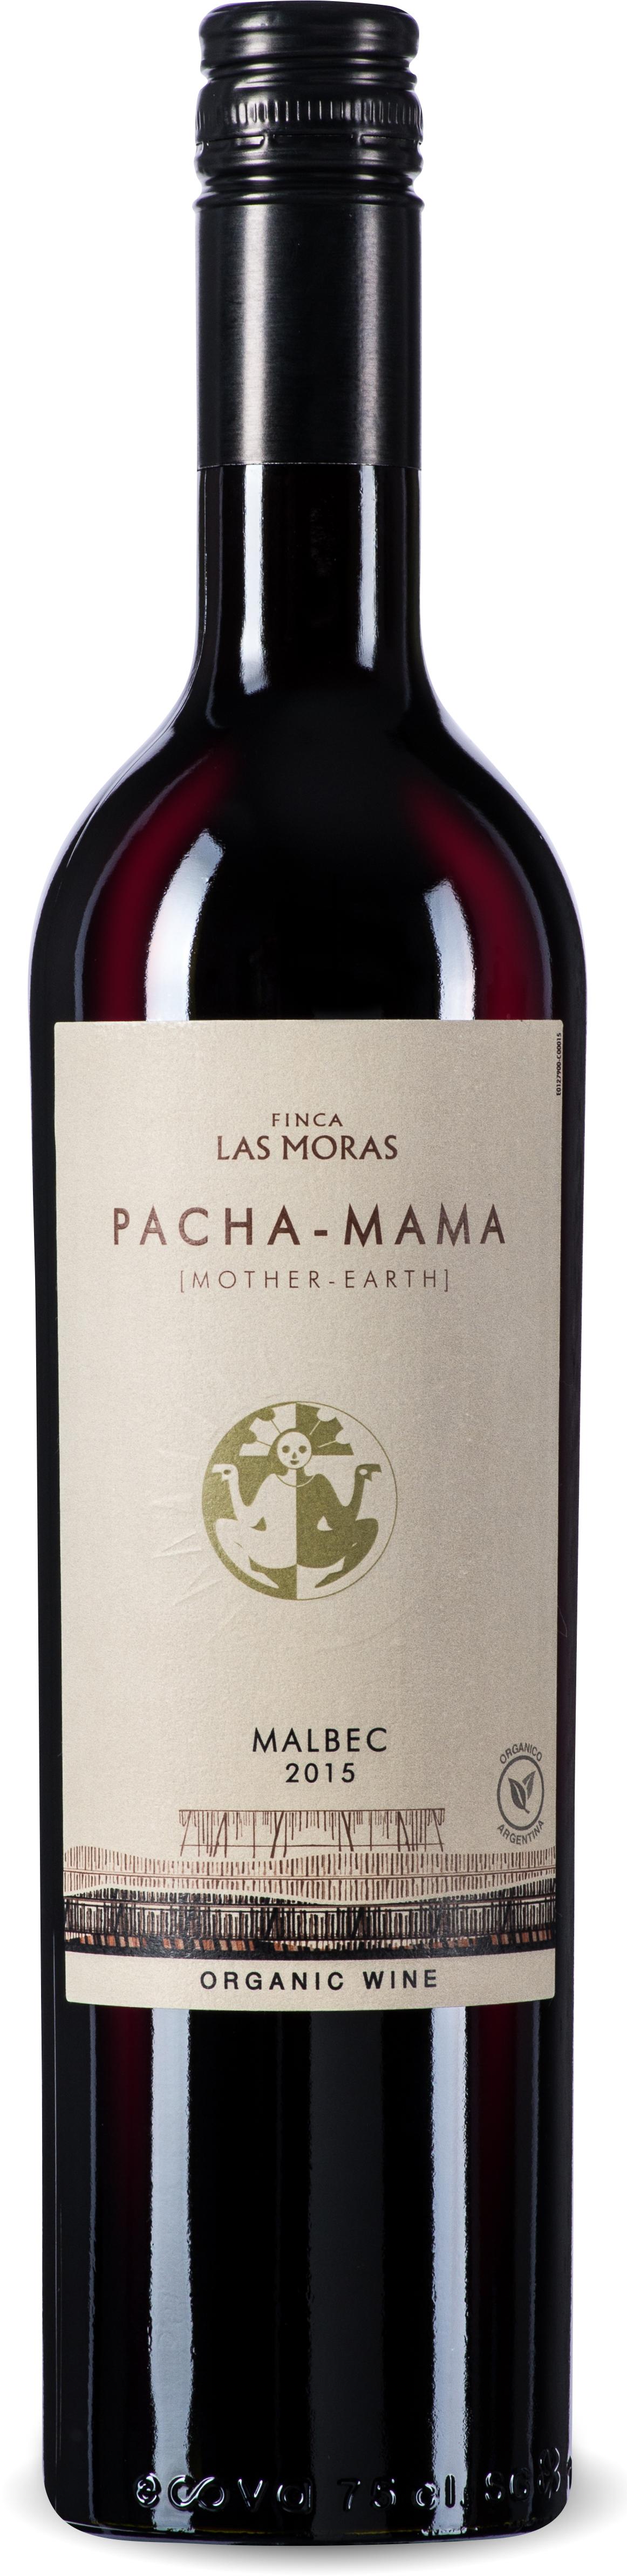 Las Moras Pacha Mama Malbec (Organic)